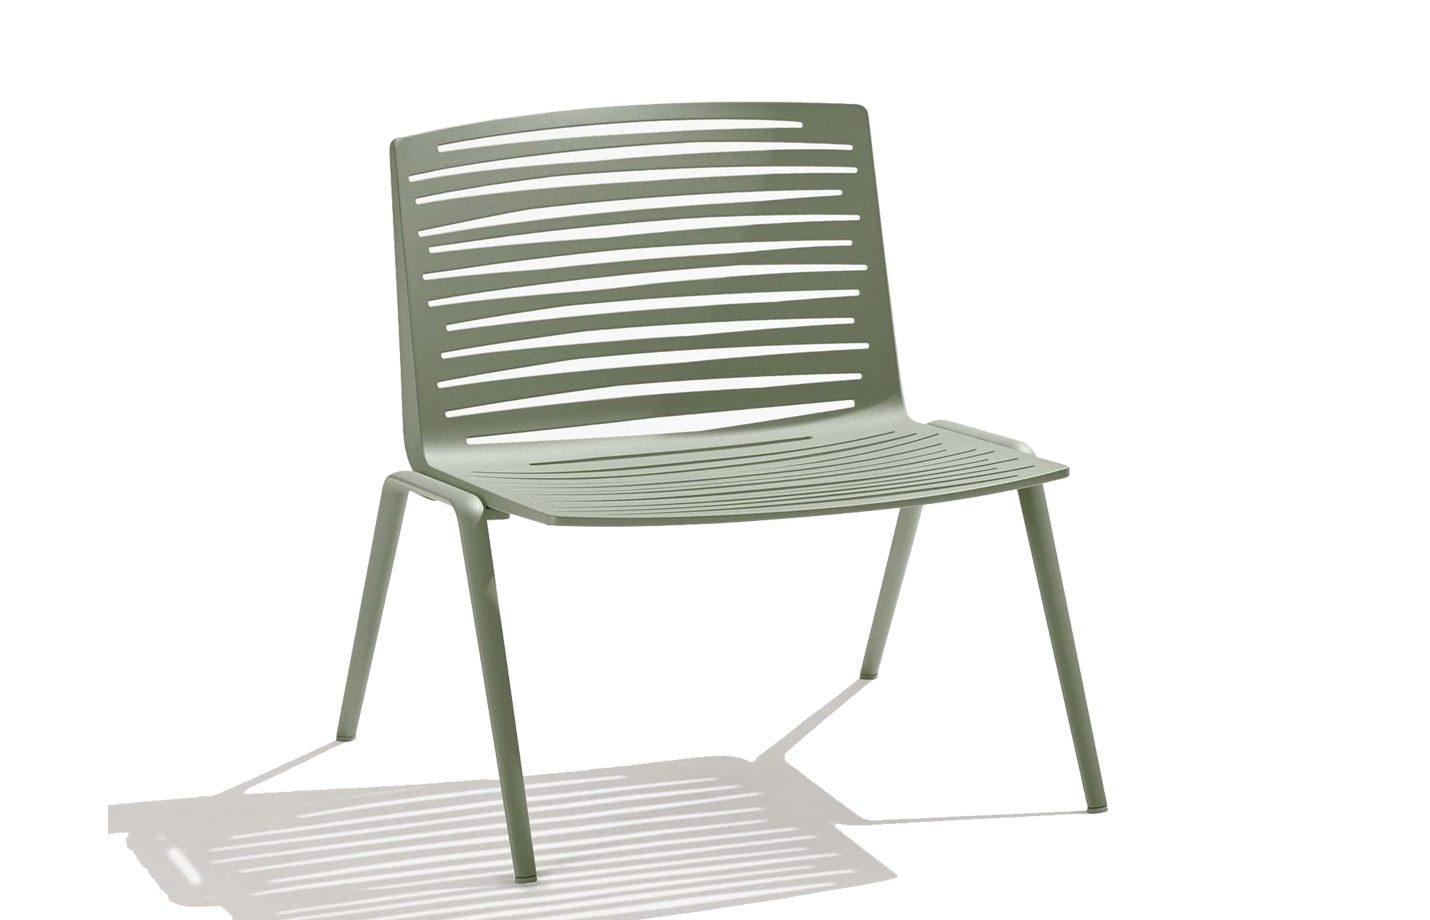 Zebra-Lounge-Chair-Outddor-01